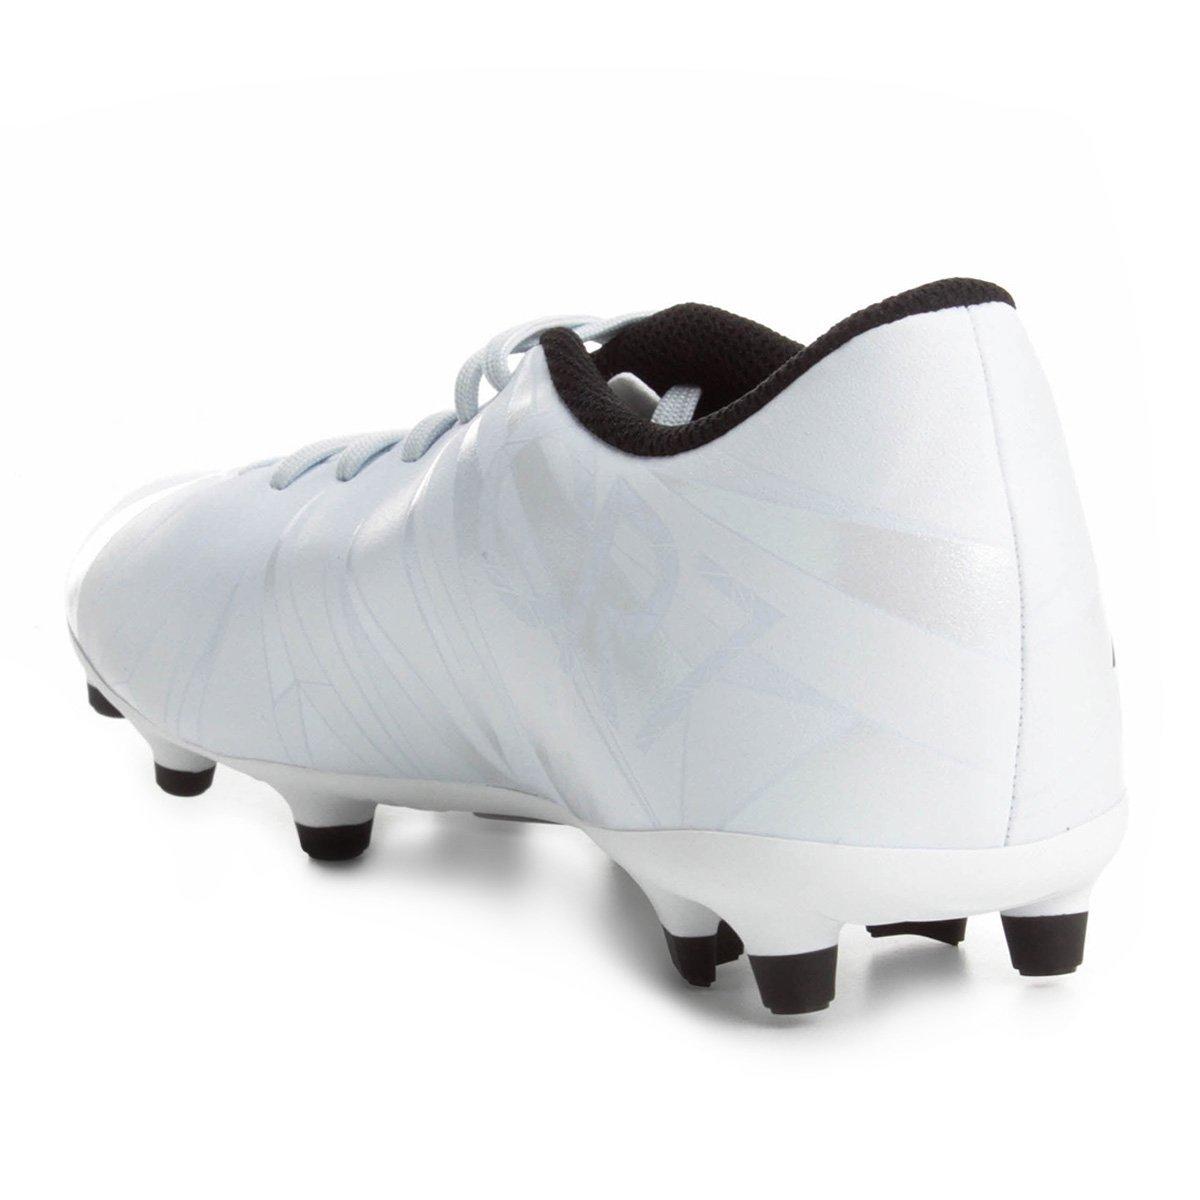 ... e Nike Vortex Mercurial Campo Masculina 3 CR7 FG Branco Preto Chuteira  5ZOzqfwf ... d4bf43665eb54